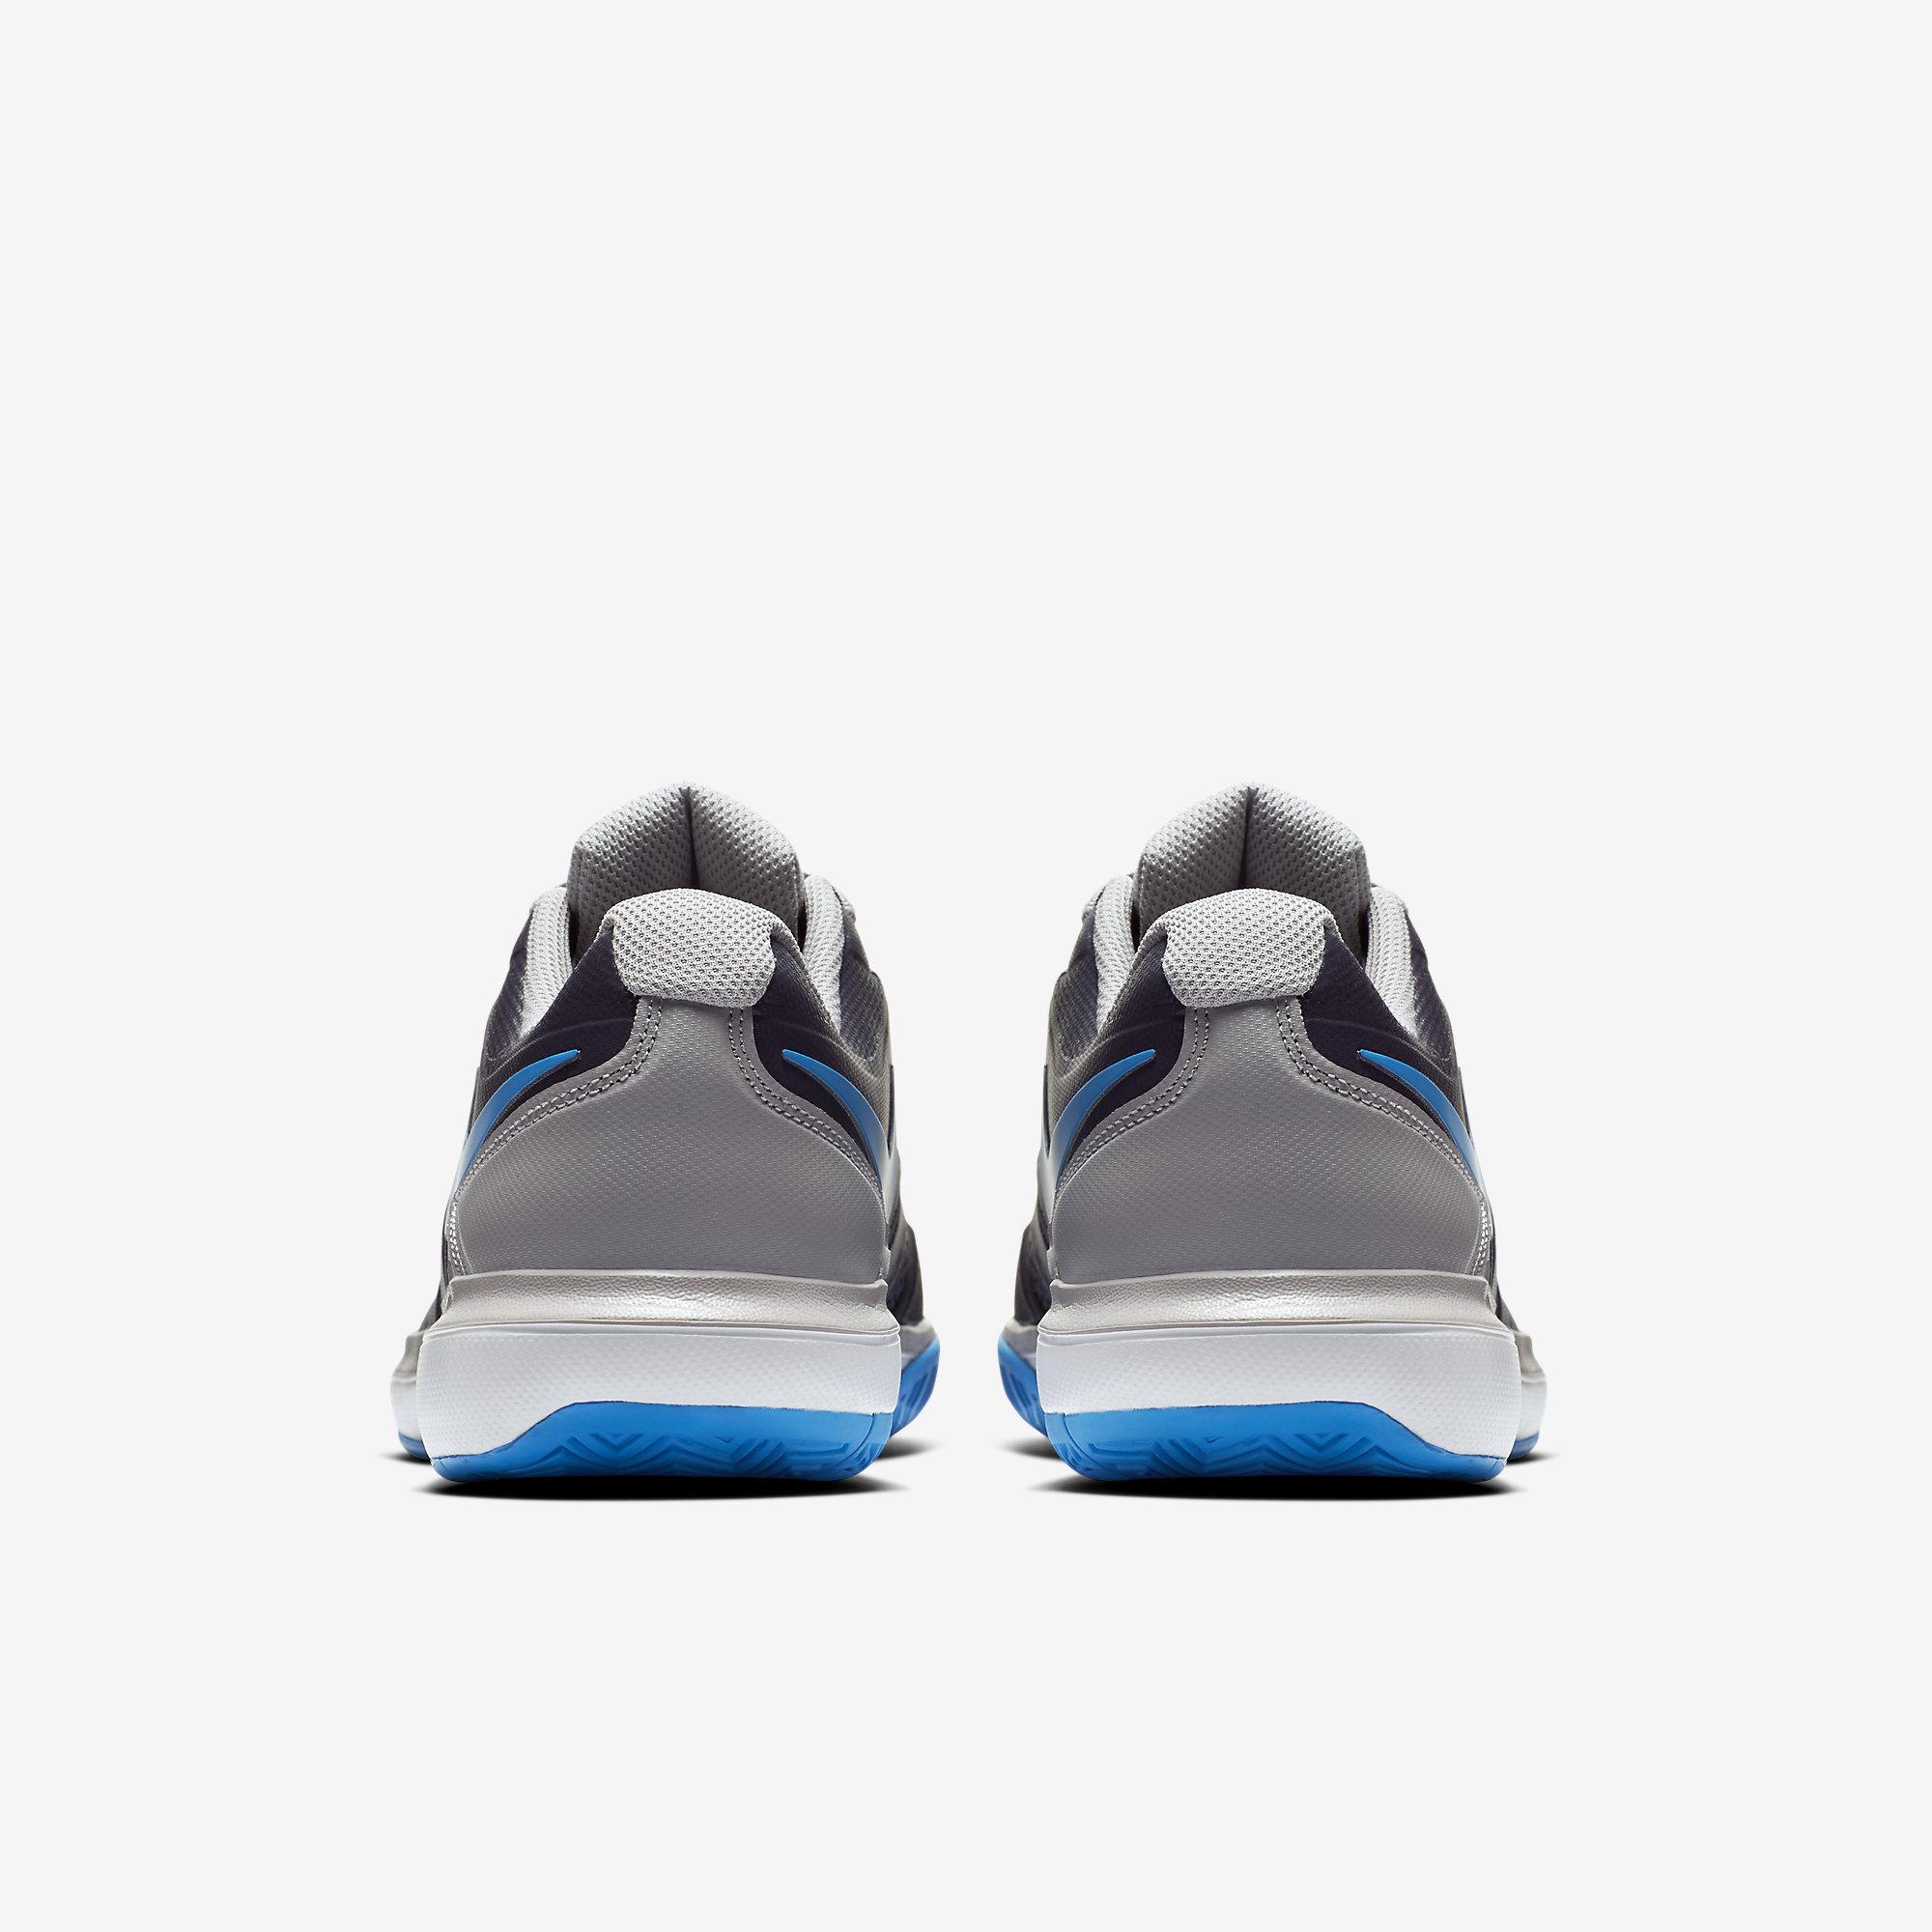 finest selection 9ebc9 fbe3e Nike Mens Air Zoom Prestige Tennis Shoes - Gridiron Atmosphere Grey